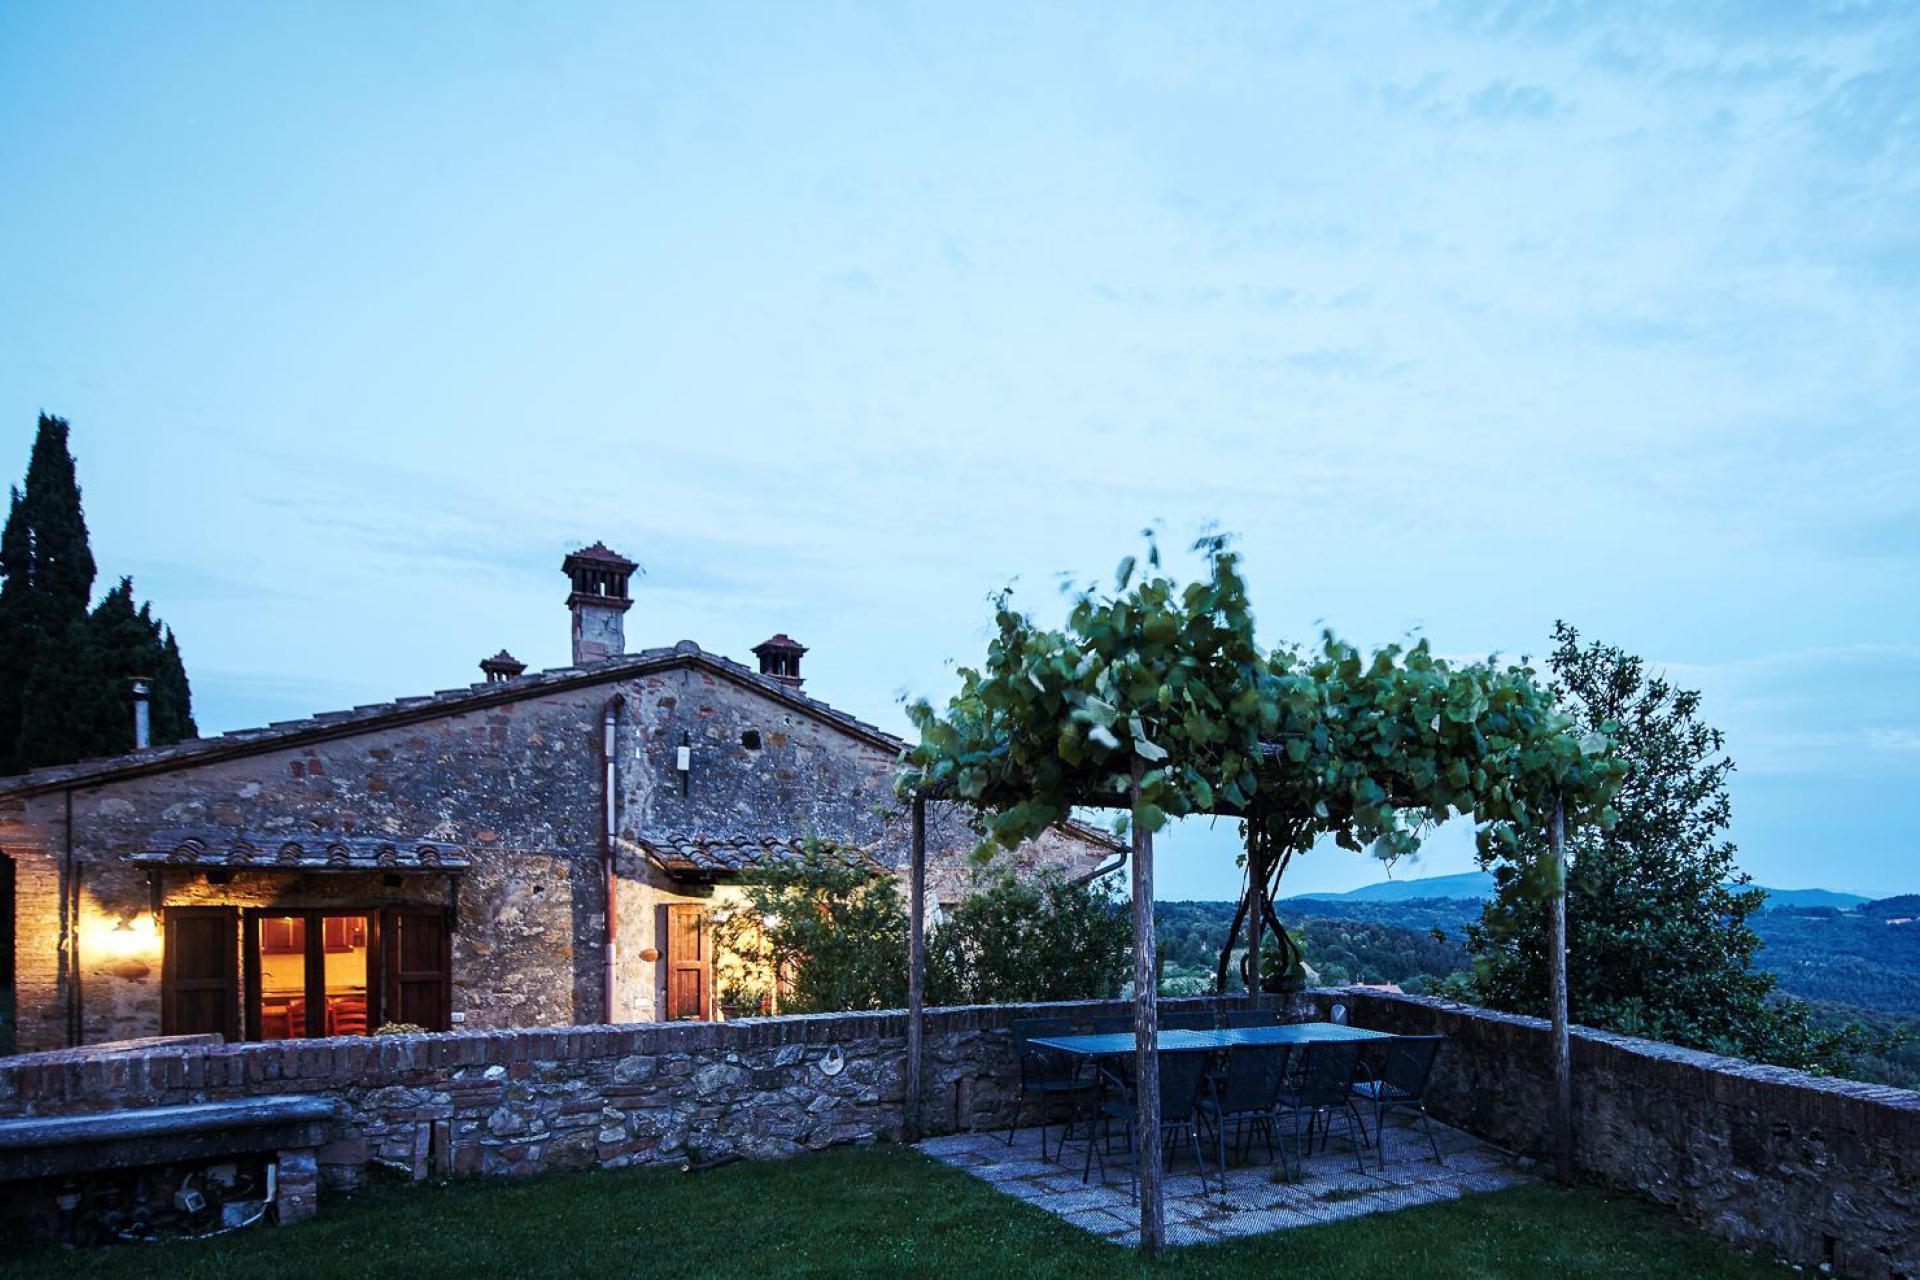 Agriturismo Toscane Authentieke agriturismo en wijnboerderij in Toscane